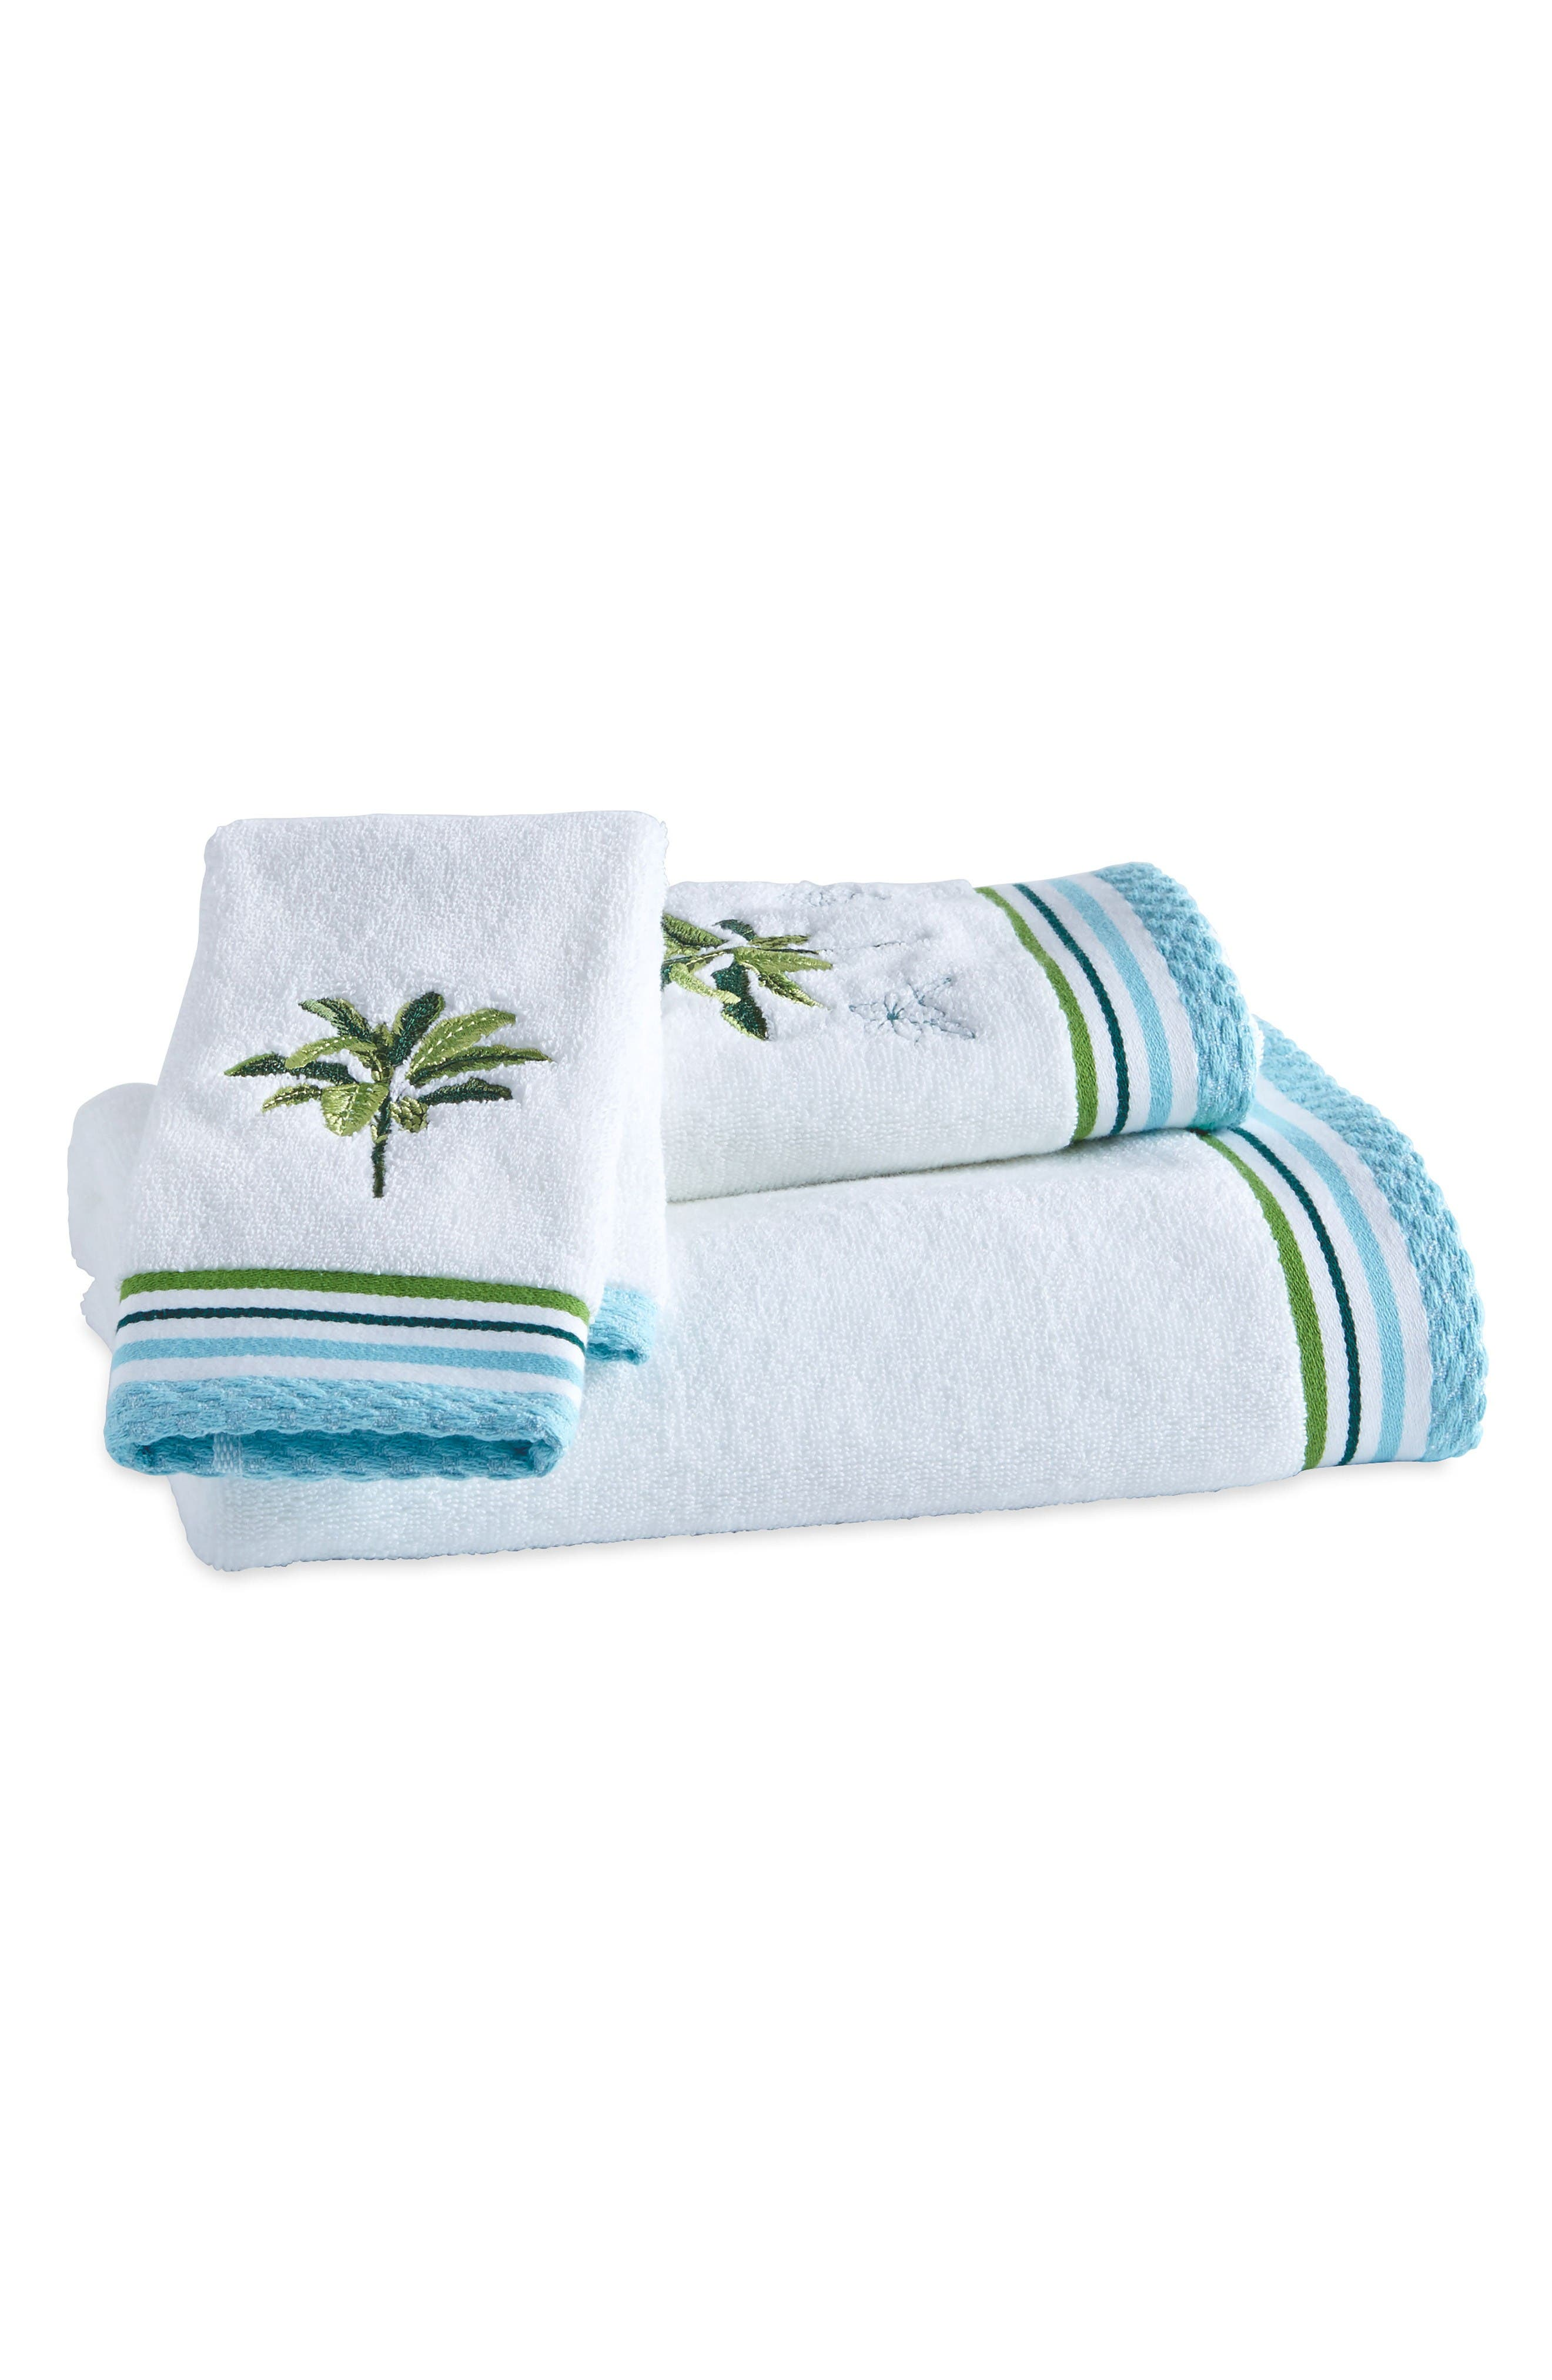 Main Image - Destinations Tropical Palm Bath Towel, Hand Towel and Washcloth Set